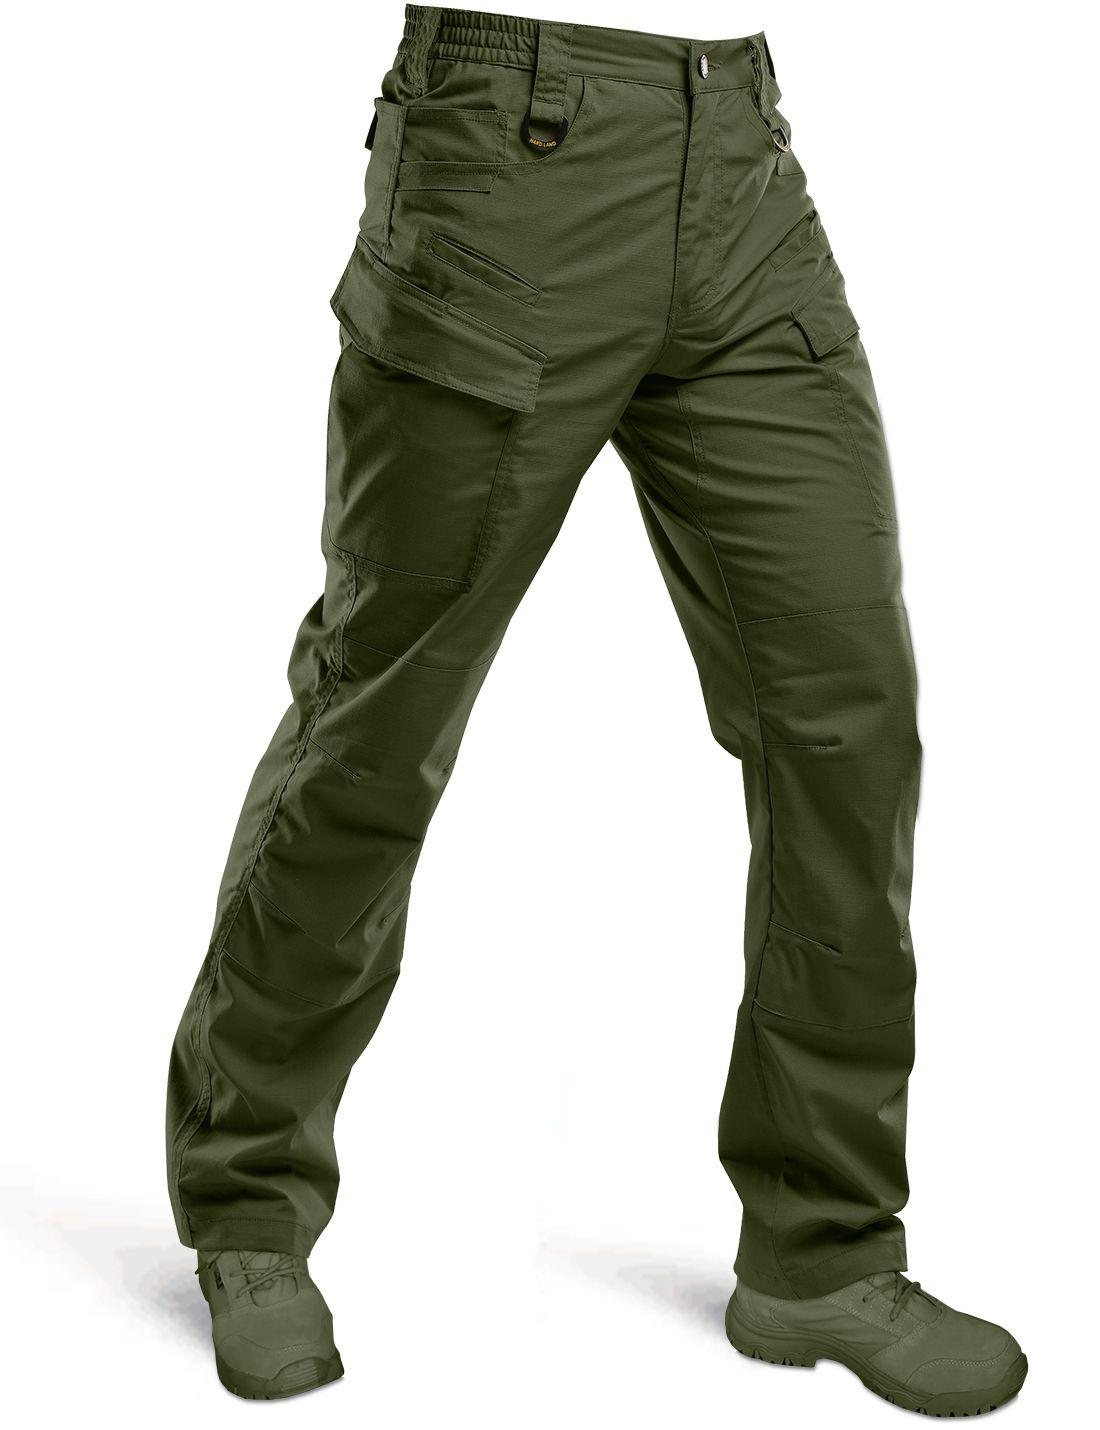 HARD LAND Mens Cargo Work Shorts Quick Dry Waterproof Tactical Shorts Hiking